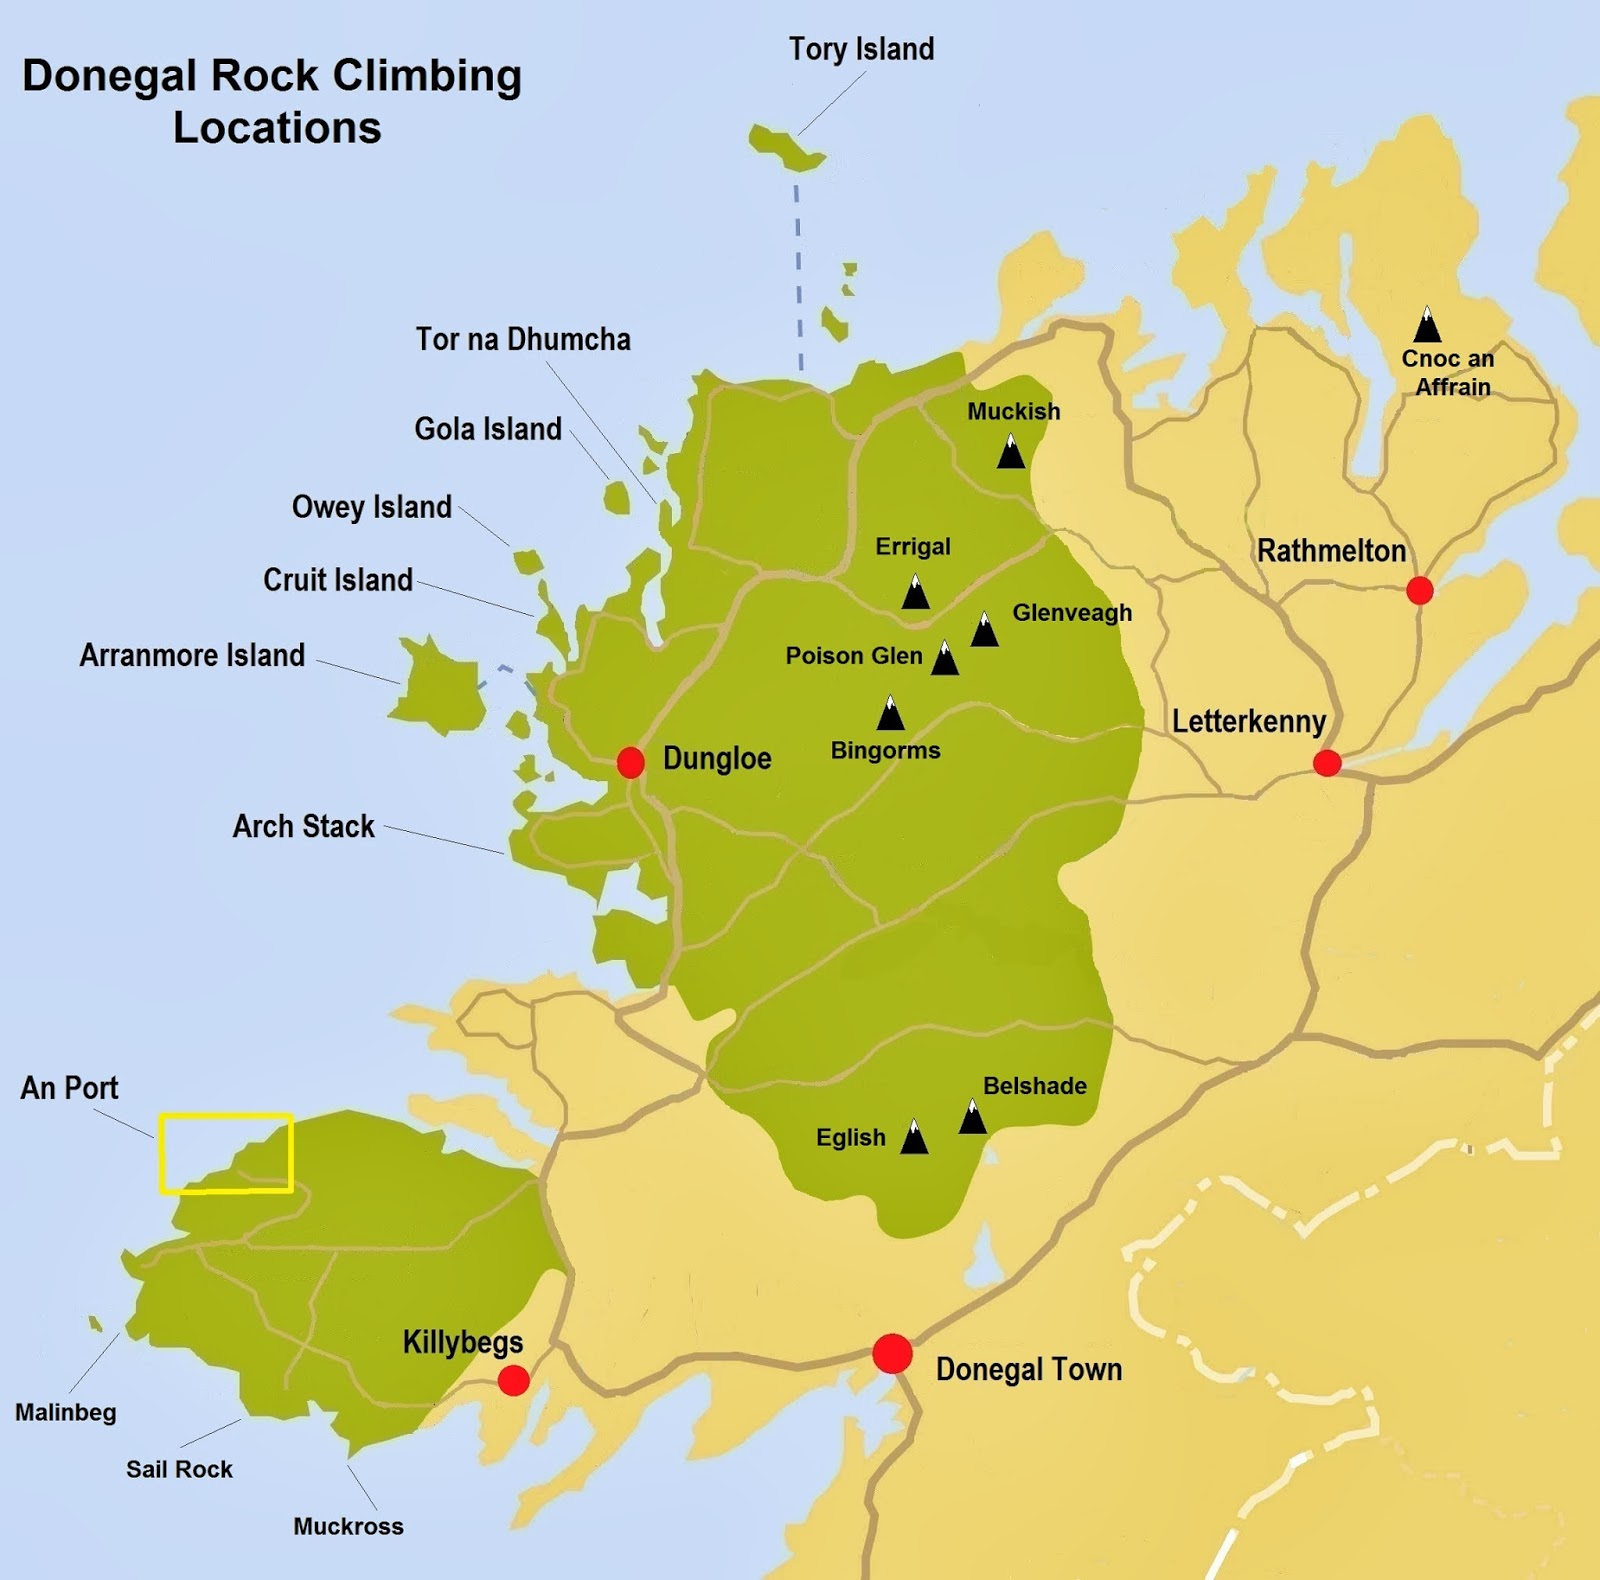 Donegal Rock Climbing. Unique Ascent: Donegal Rock Climbing 2013